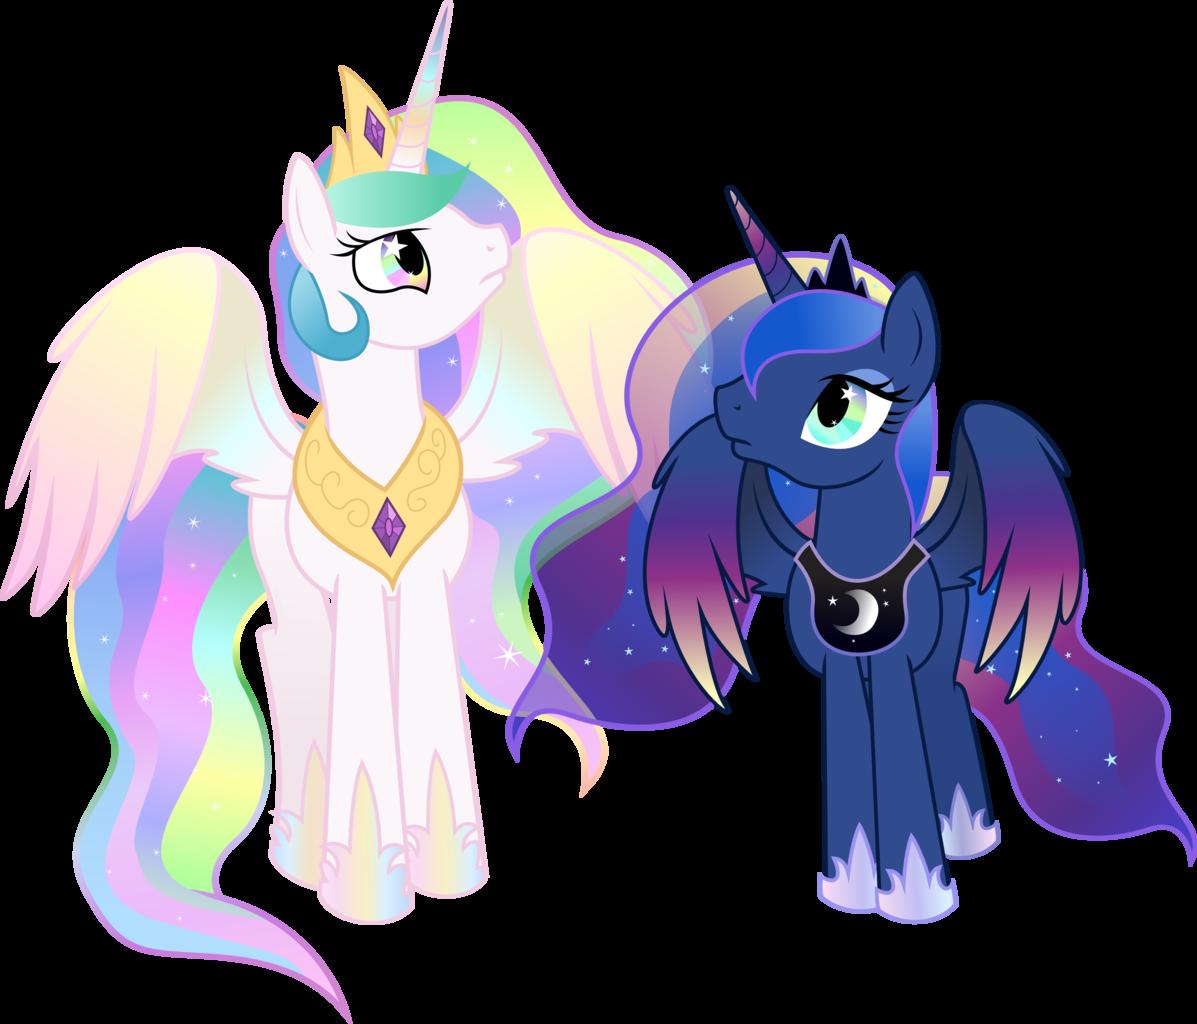 Картинки принцесс и пони